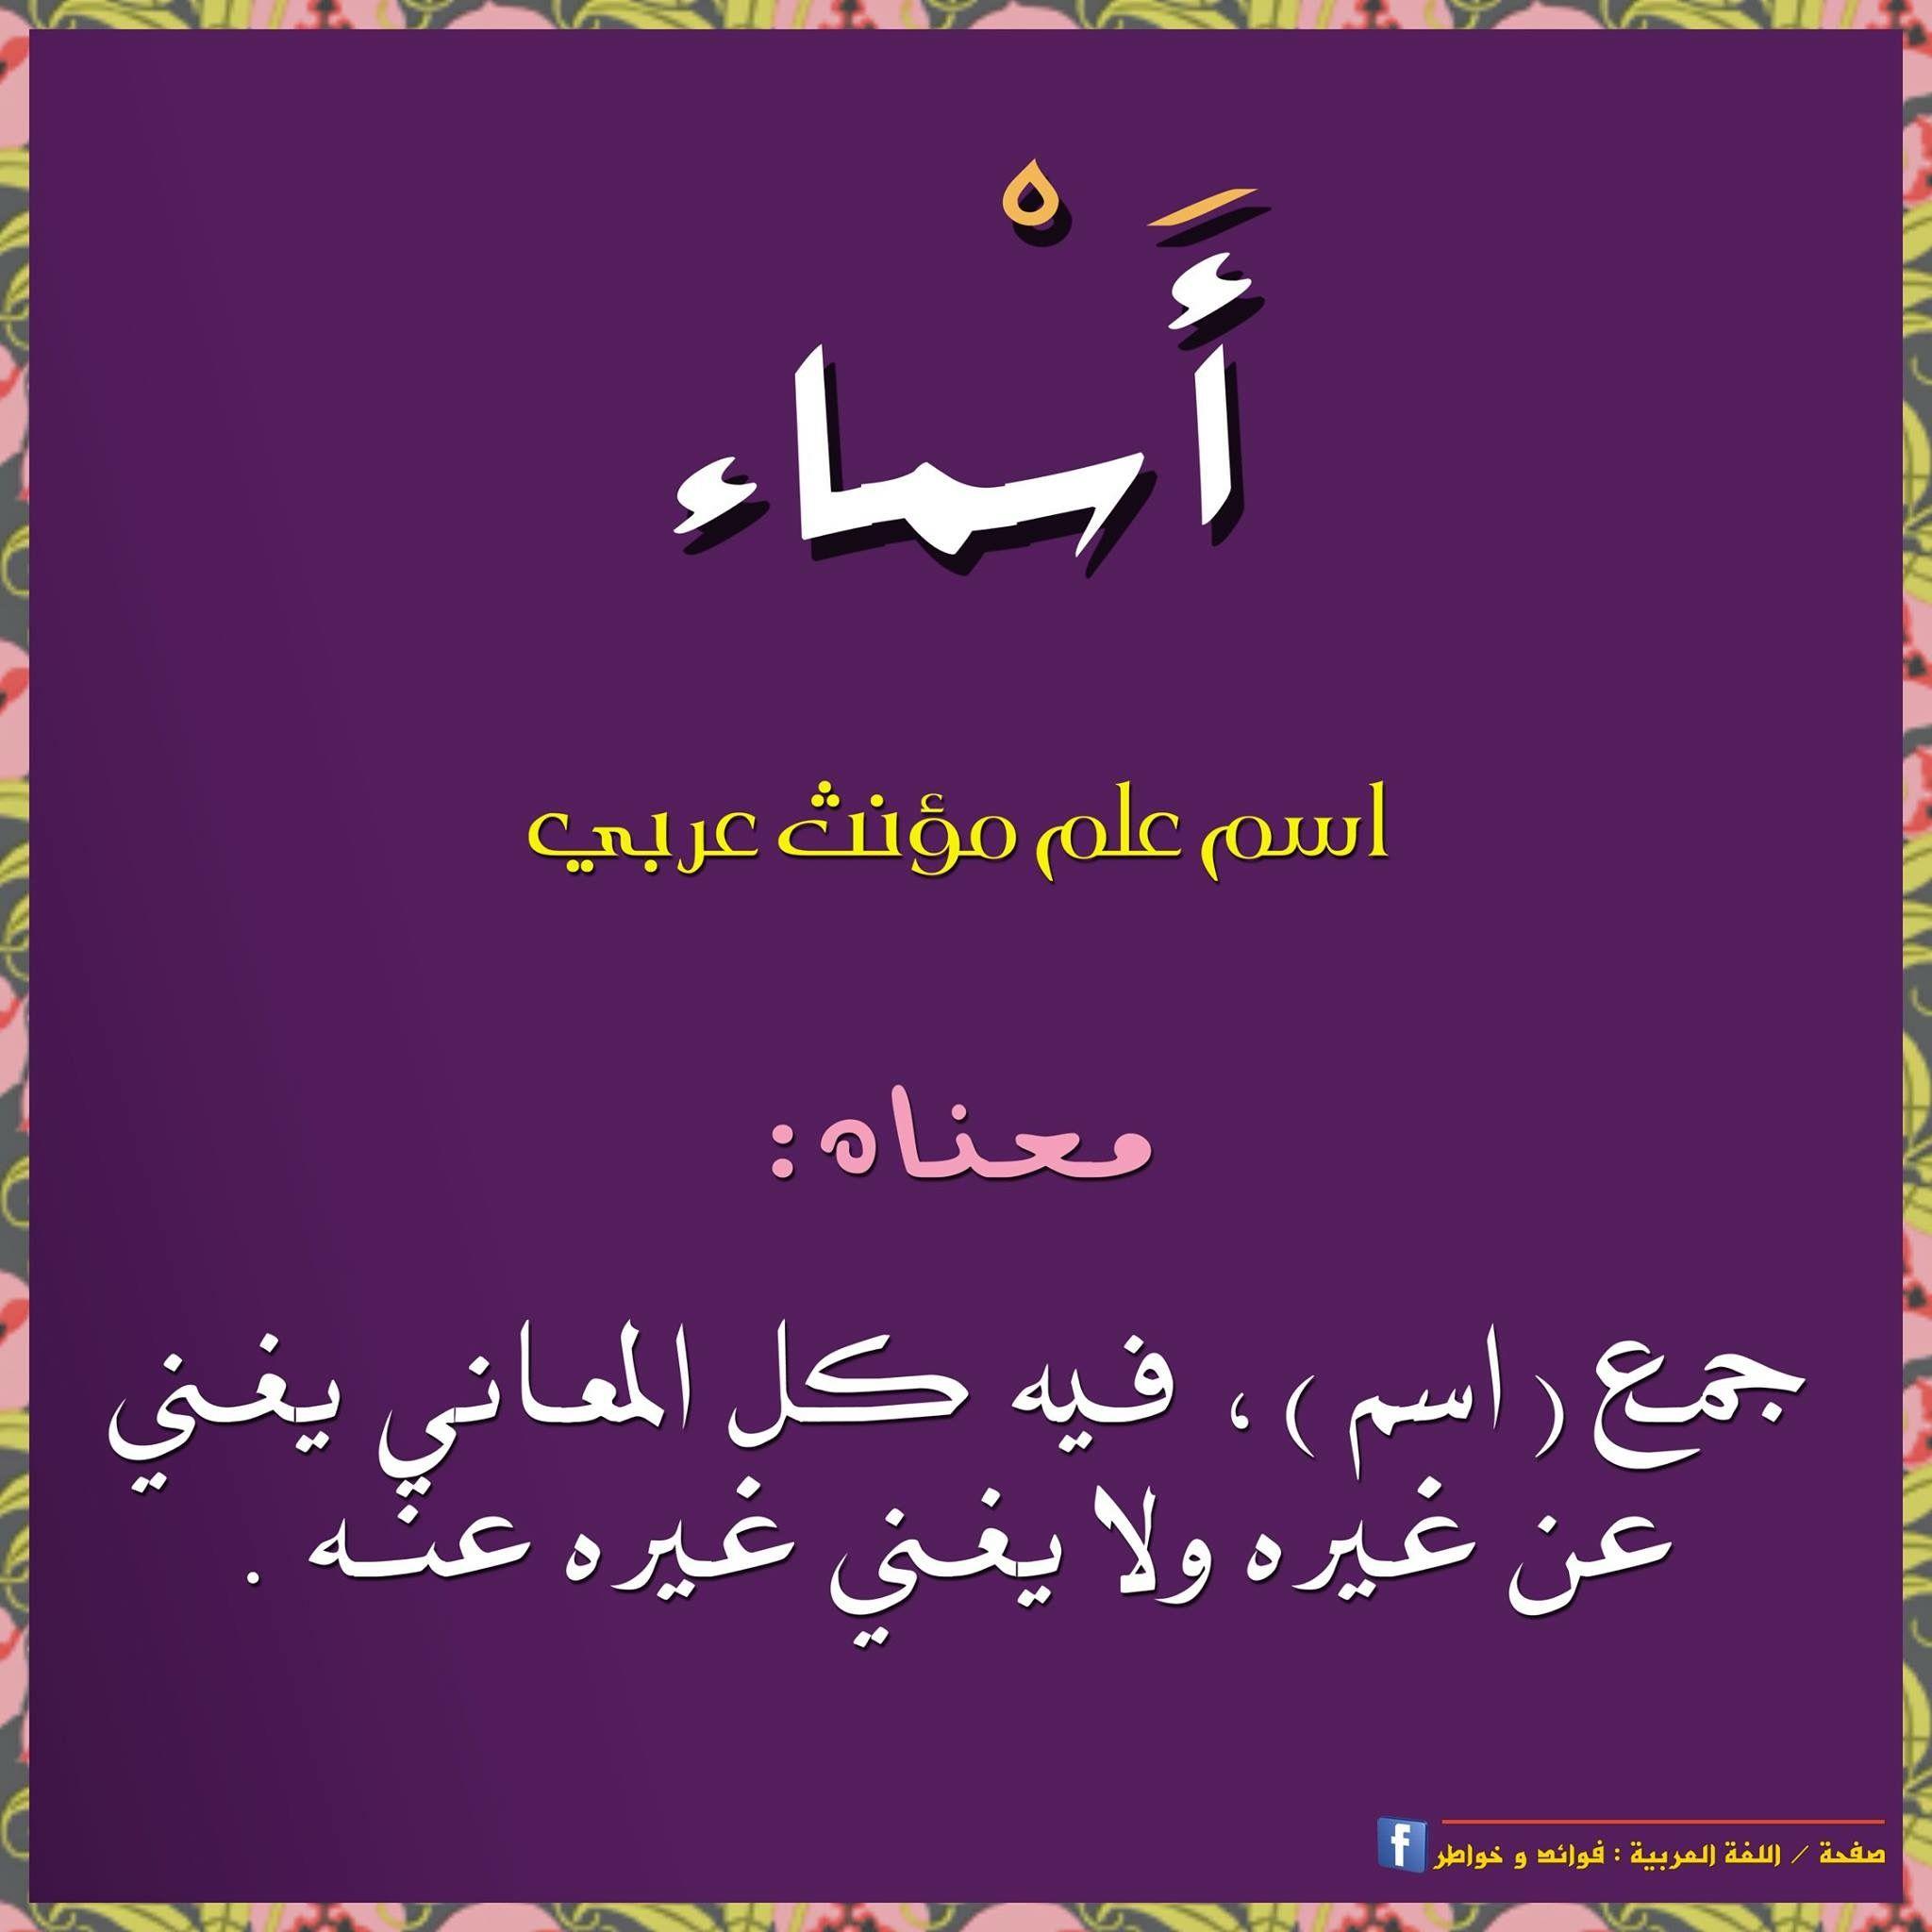 Pin By Meema On منوعة عربية Quotations Learn Arabic Language Words